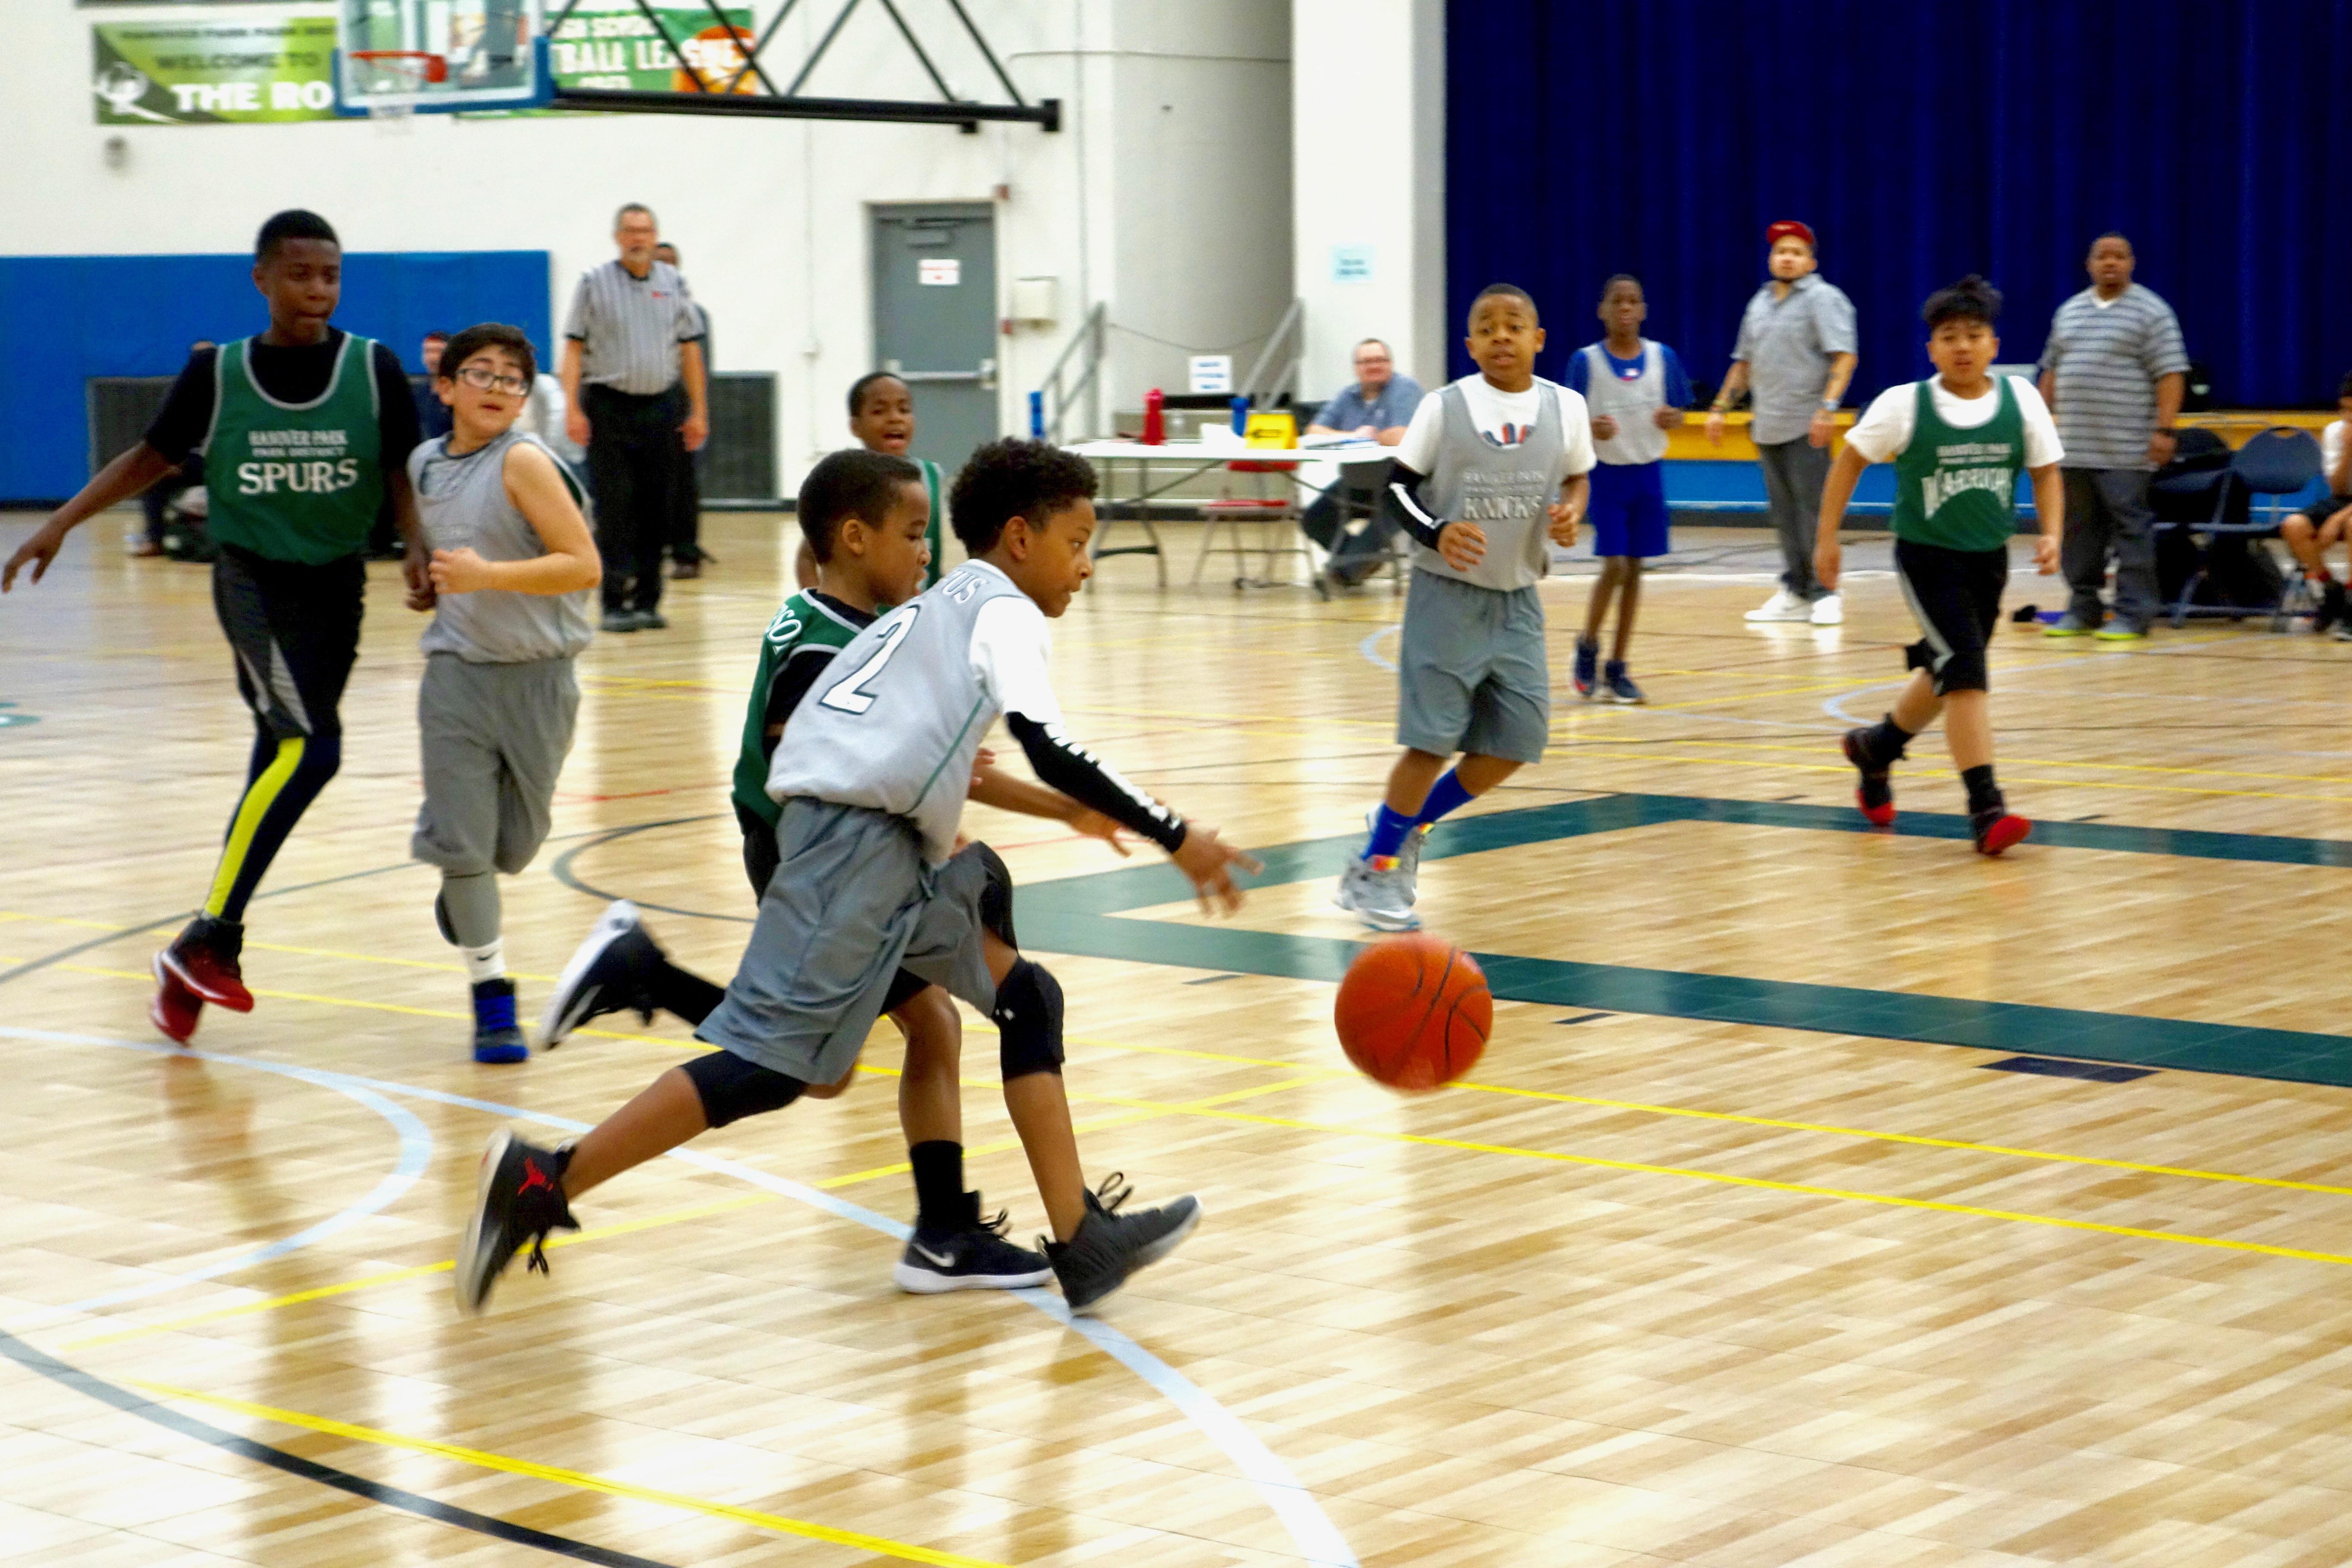 Basketball Leques